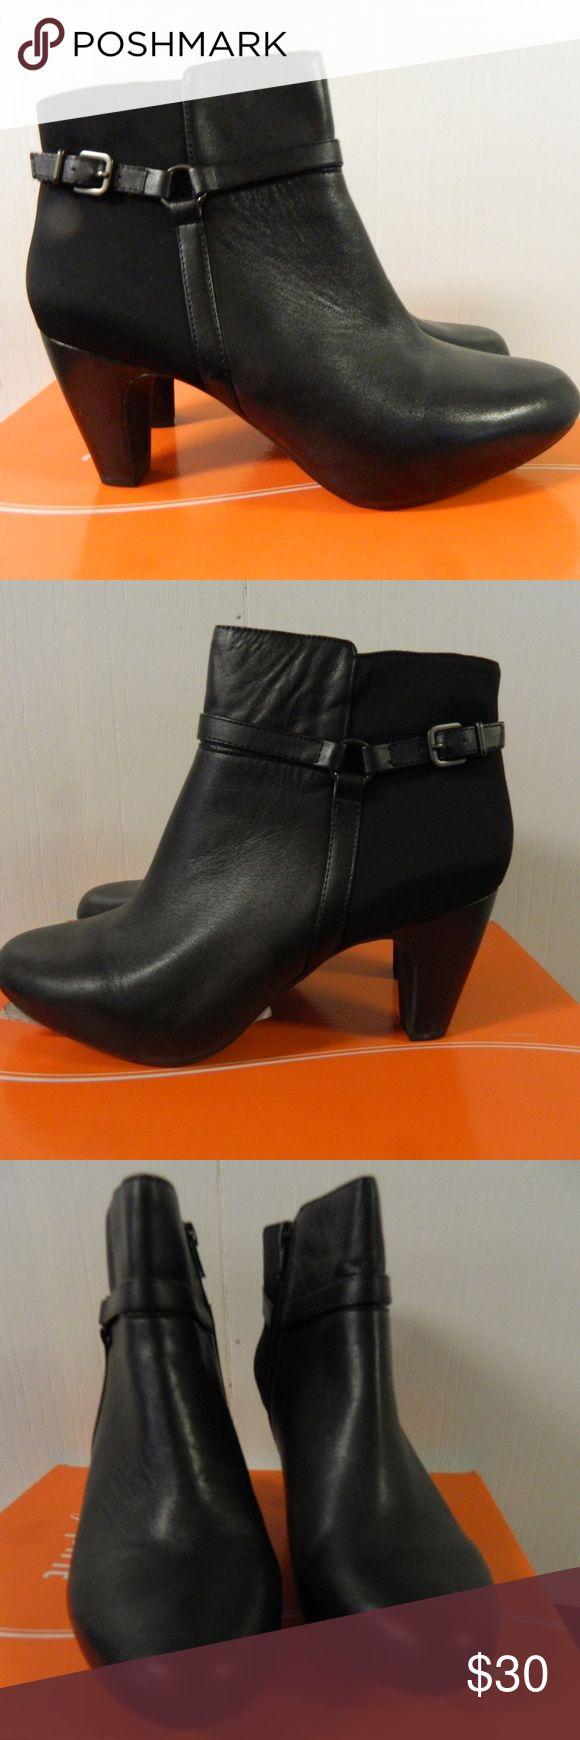 "Easy Spirit Pedrina Ankle Boots sz 91/2 M NIB Excellent condition.  Side zipper opening.  3 "" heel.  Black Easy Spirit Shoes Ankle Boots & Booties"